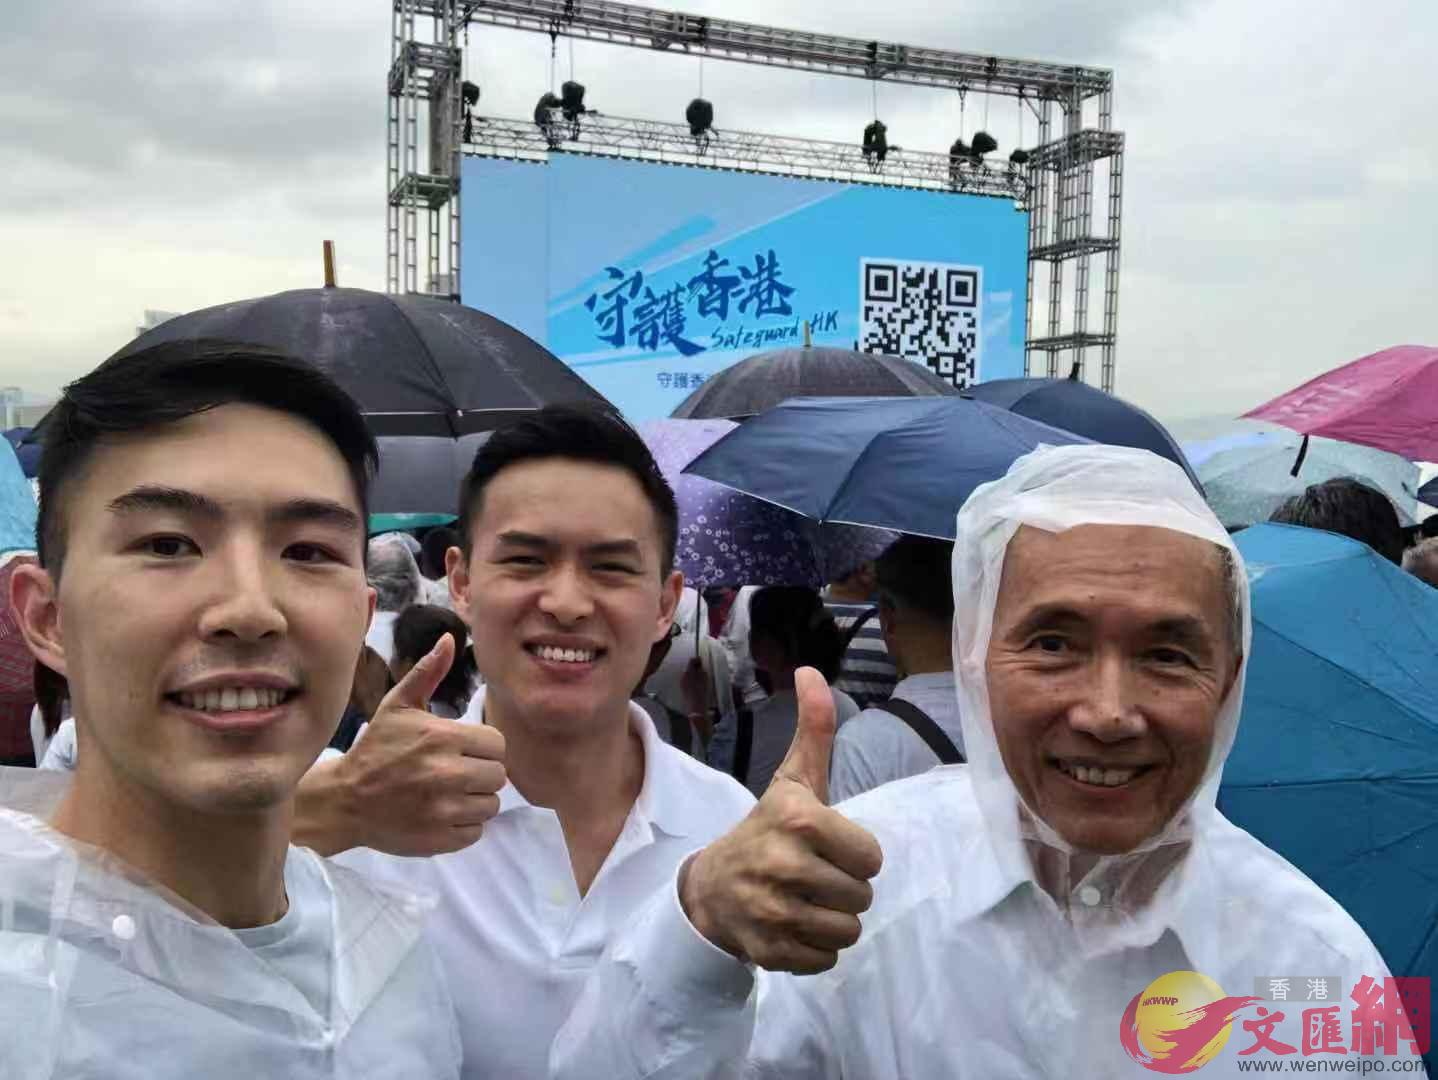 http://assets.wenweipo.com/image/2019/07/20/xiaoshuang_27b43042df7ccac167ed977b126866c7.jpg